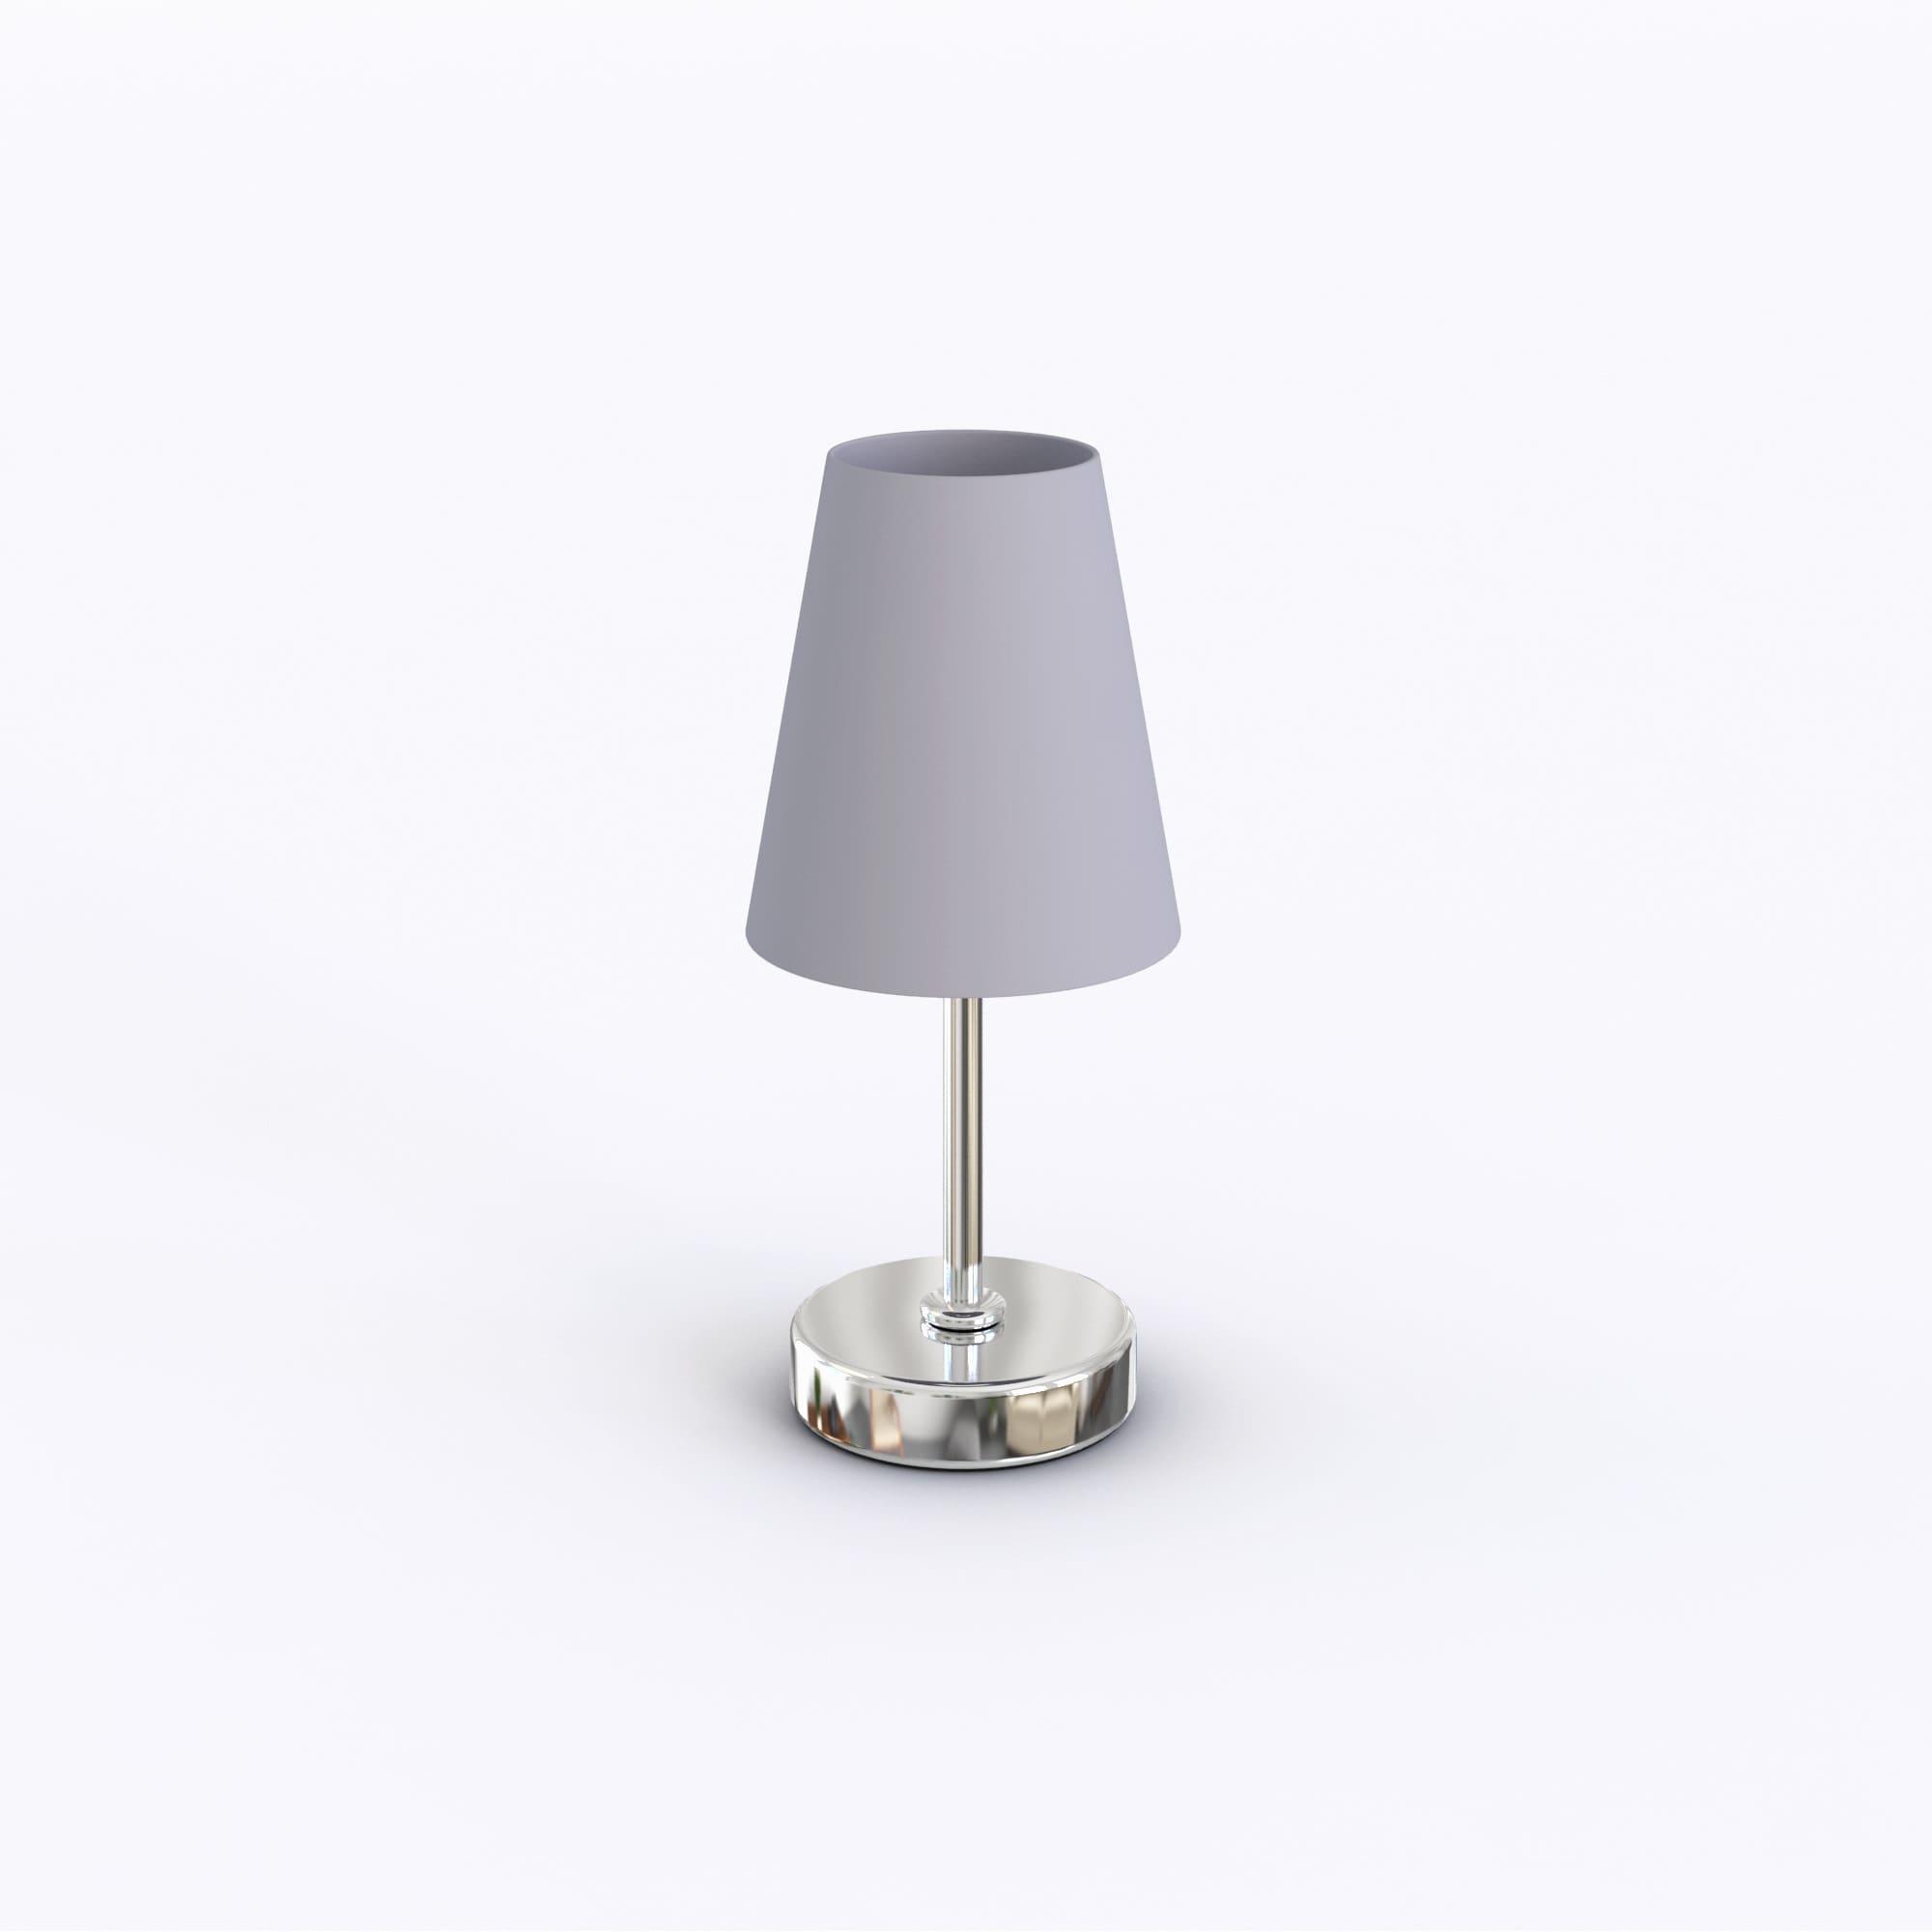 thumbnail 8 - Porch-amp-Den-Custer-Sand-Nickel-Fabric-Shade-Mini-Table-Lamp